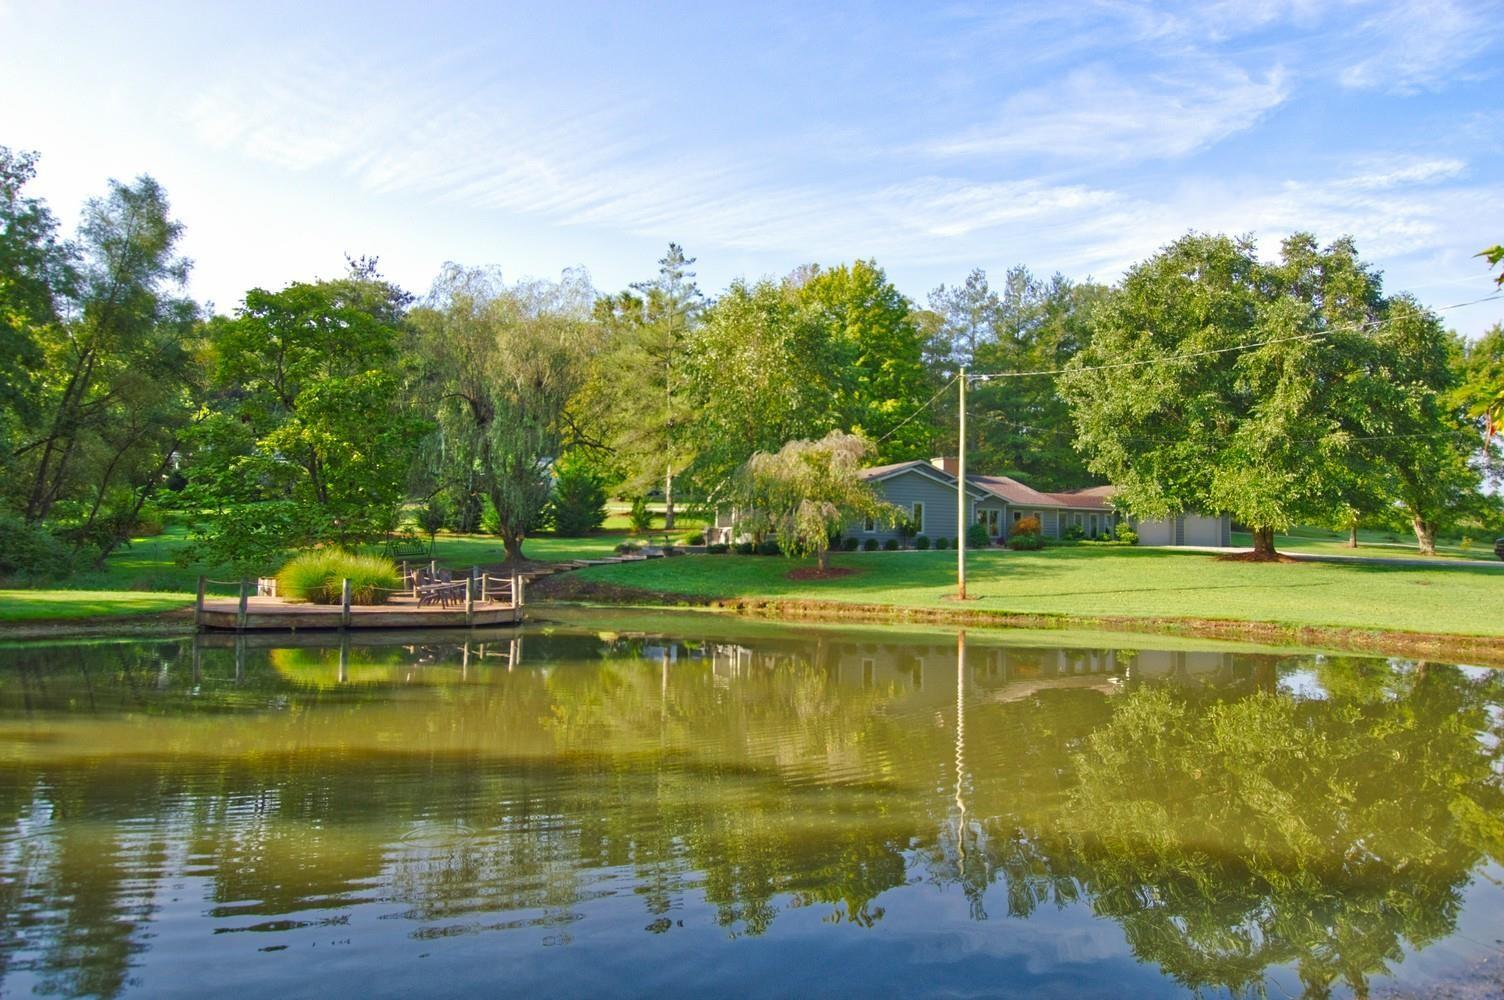 137 Spurlock Rd, Mc Minnville, TN 37110 - Mc Minnville, TN real estate listing